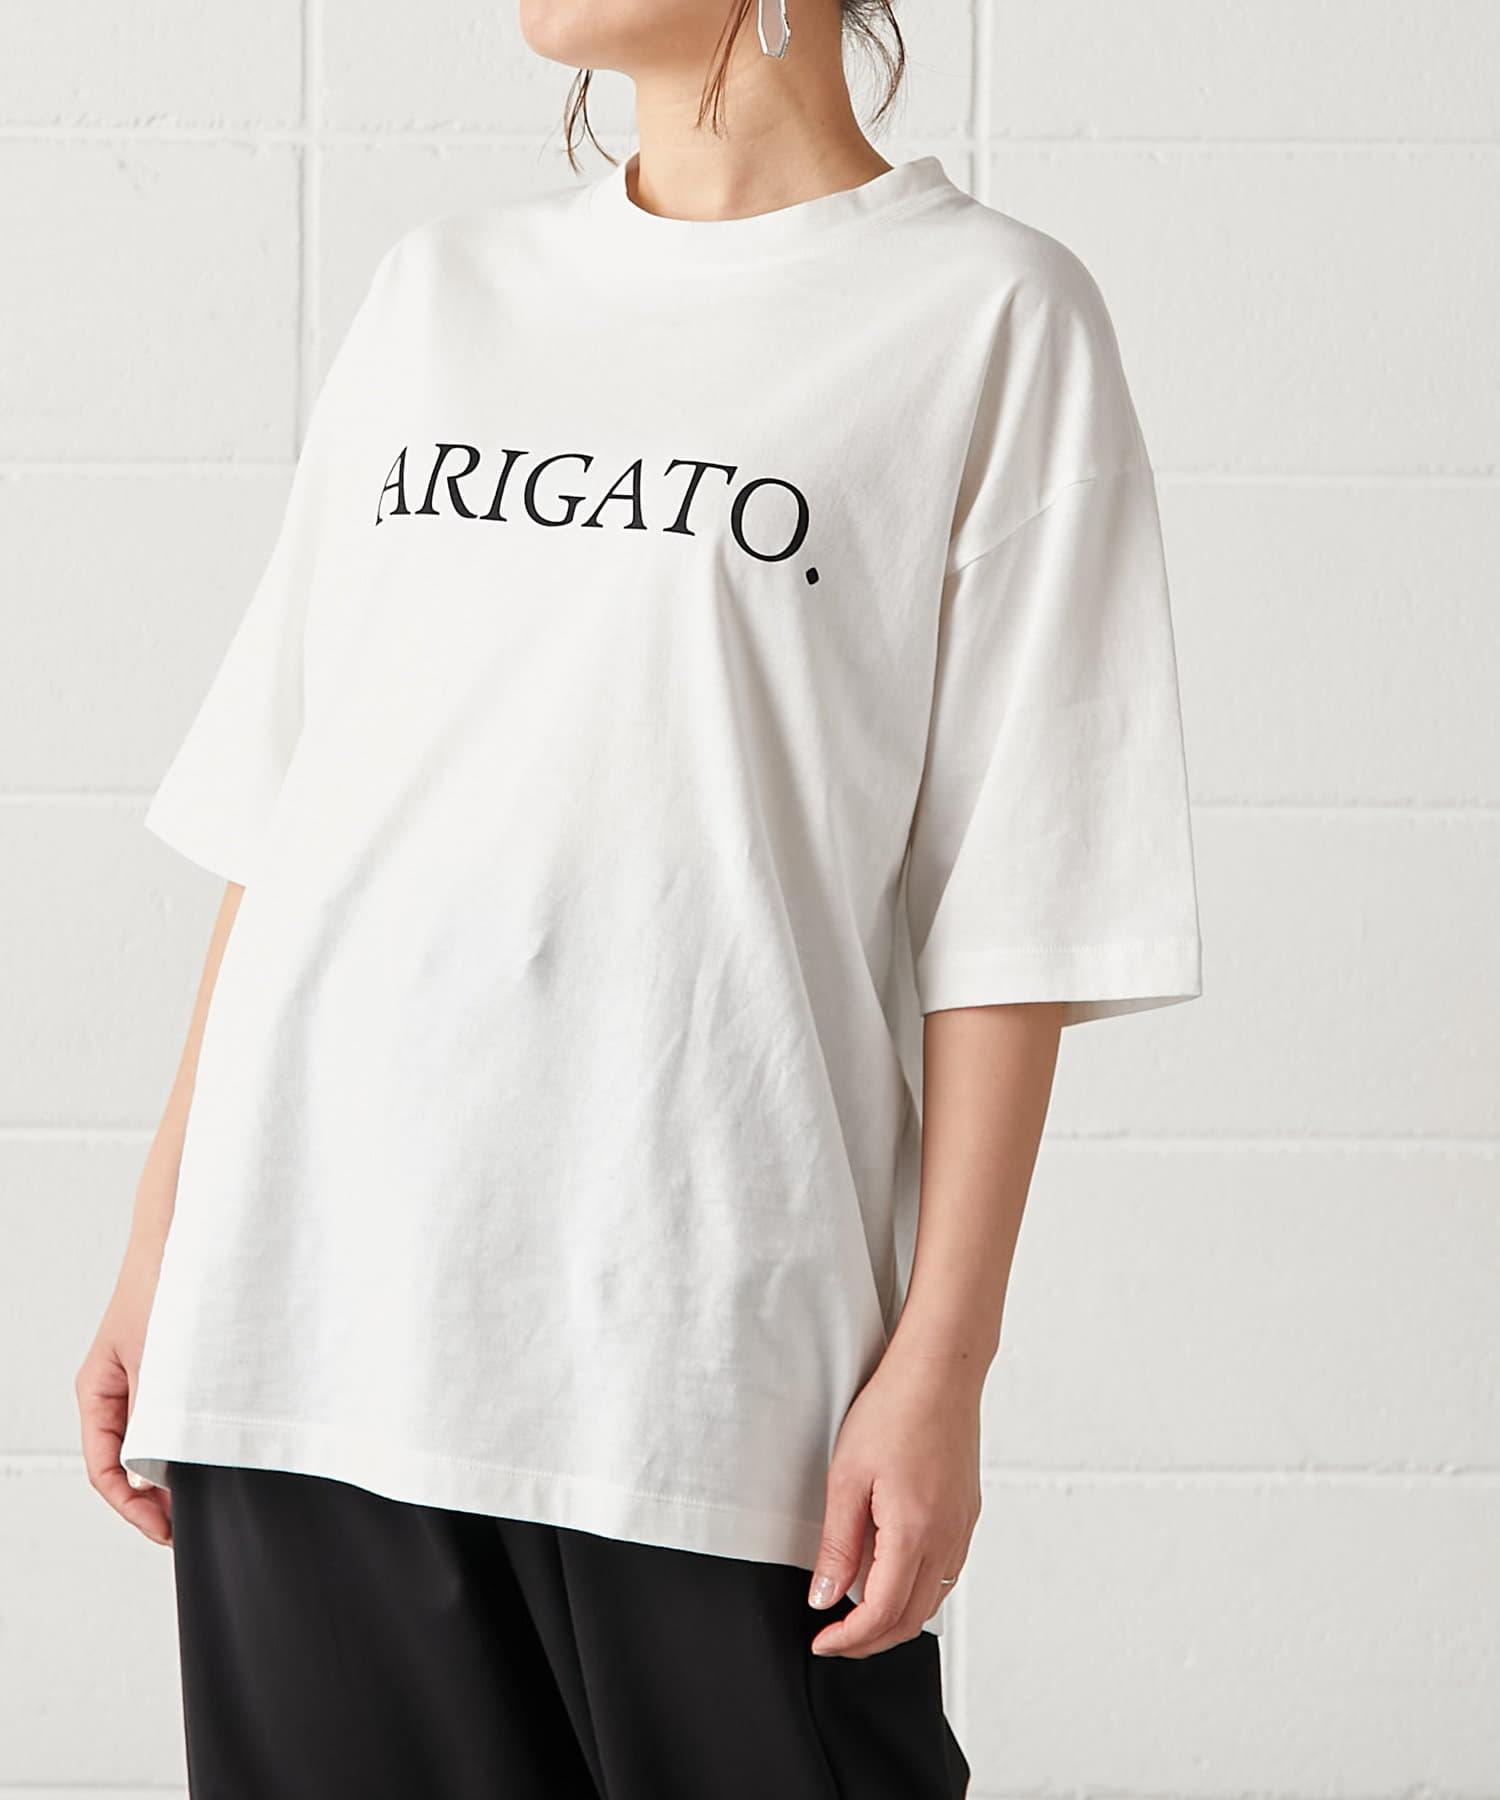 PLUS OTO.HA(プラス オトハ) ARIGATO ロゴ BOY Tシャツ